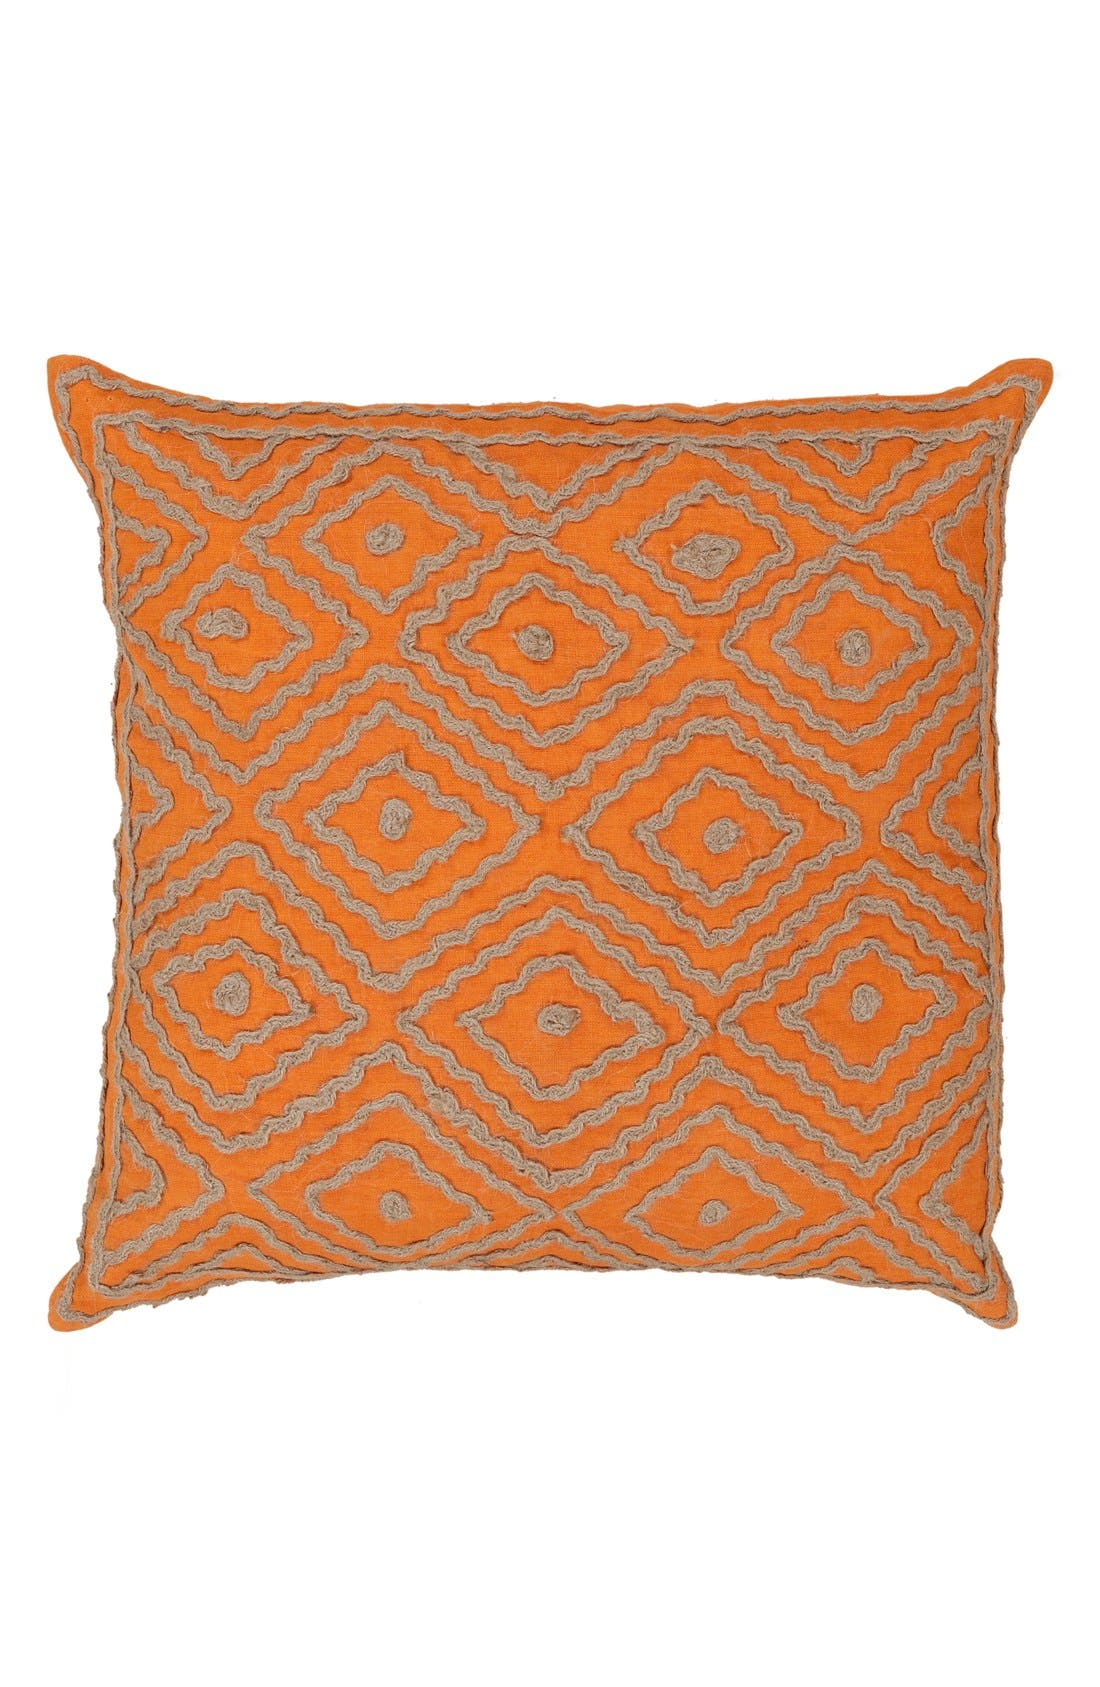 Main Image - Surya Home 'Atlas' Pillow